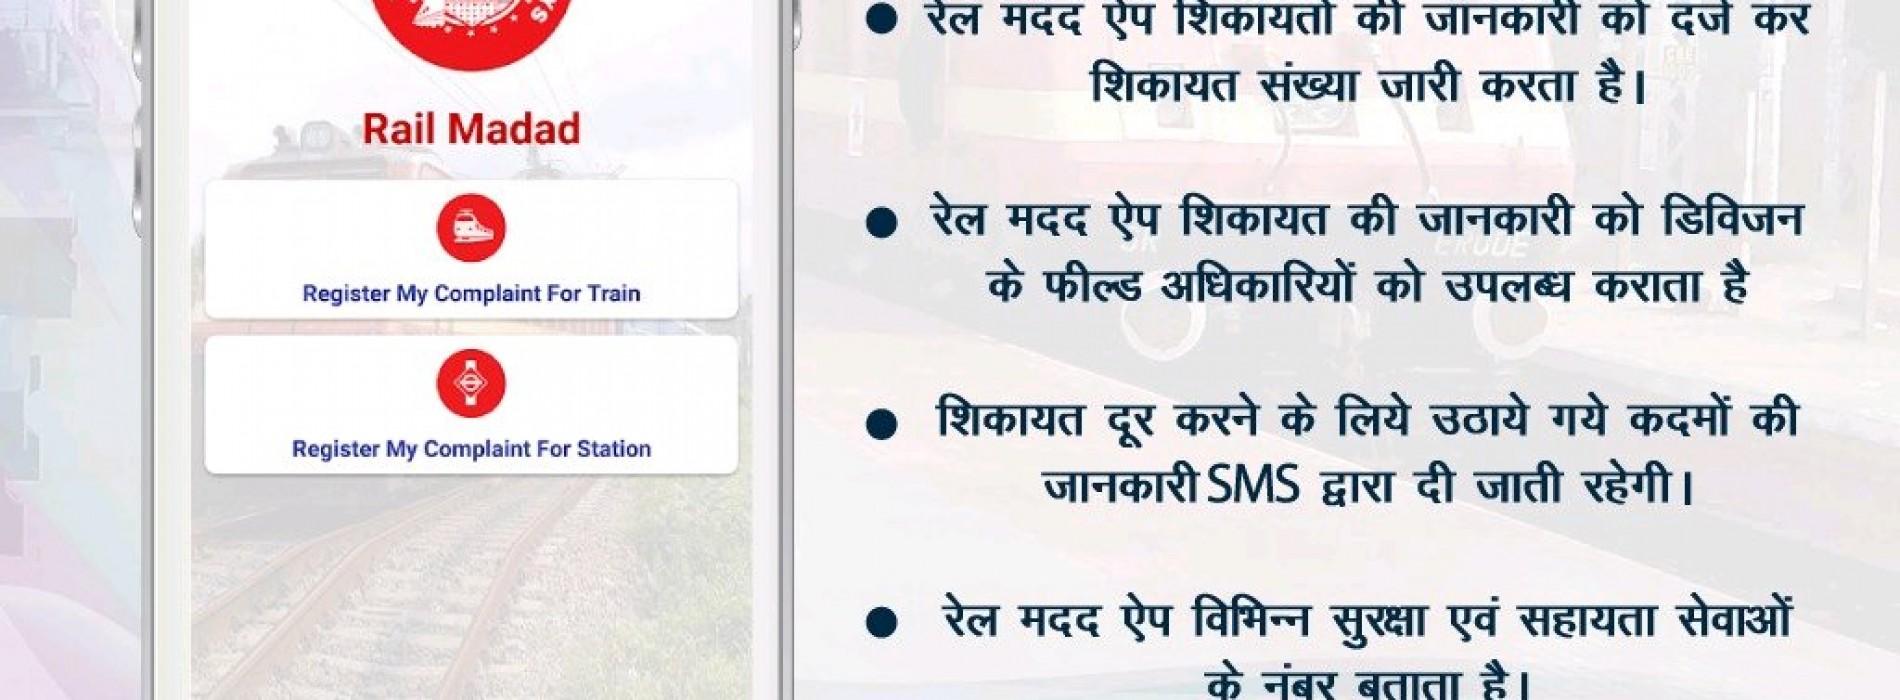 Railways launches 'Rail Madad' app